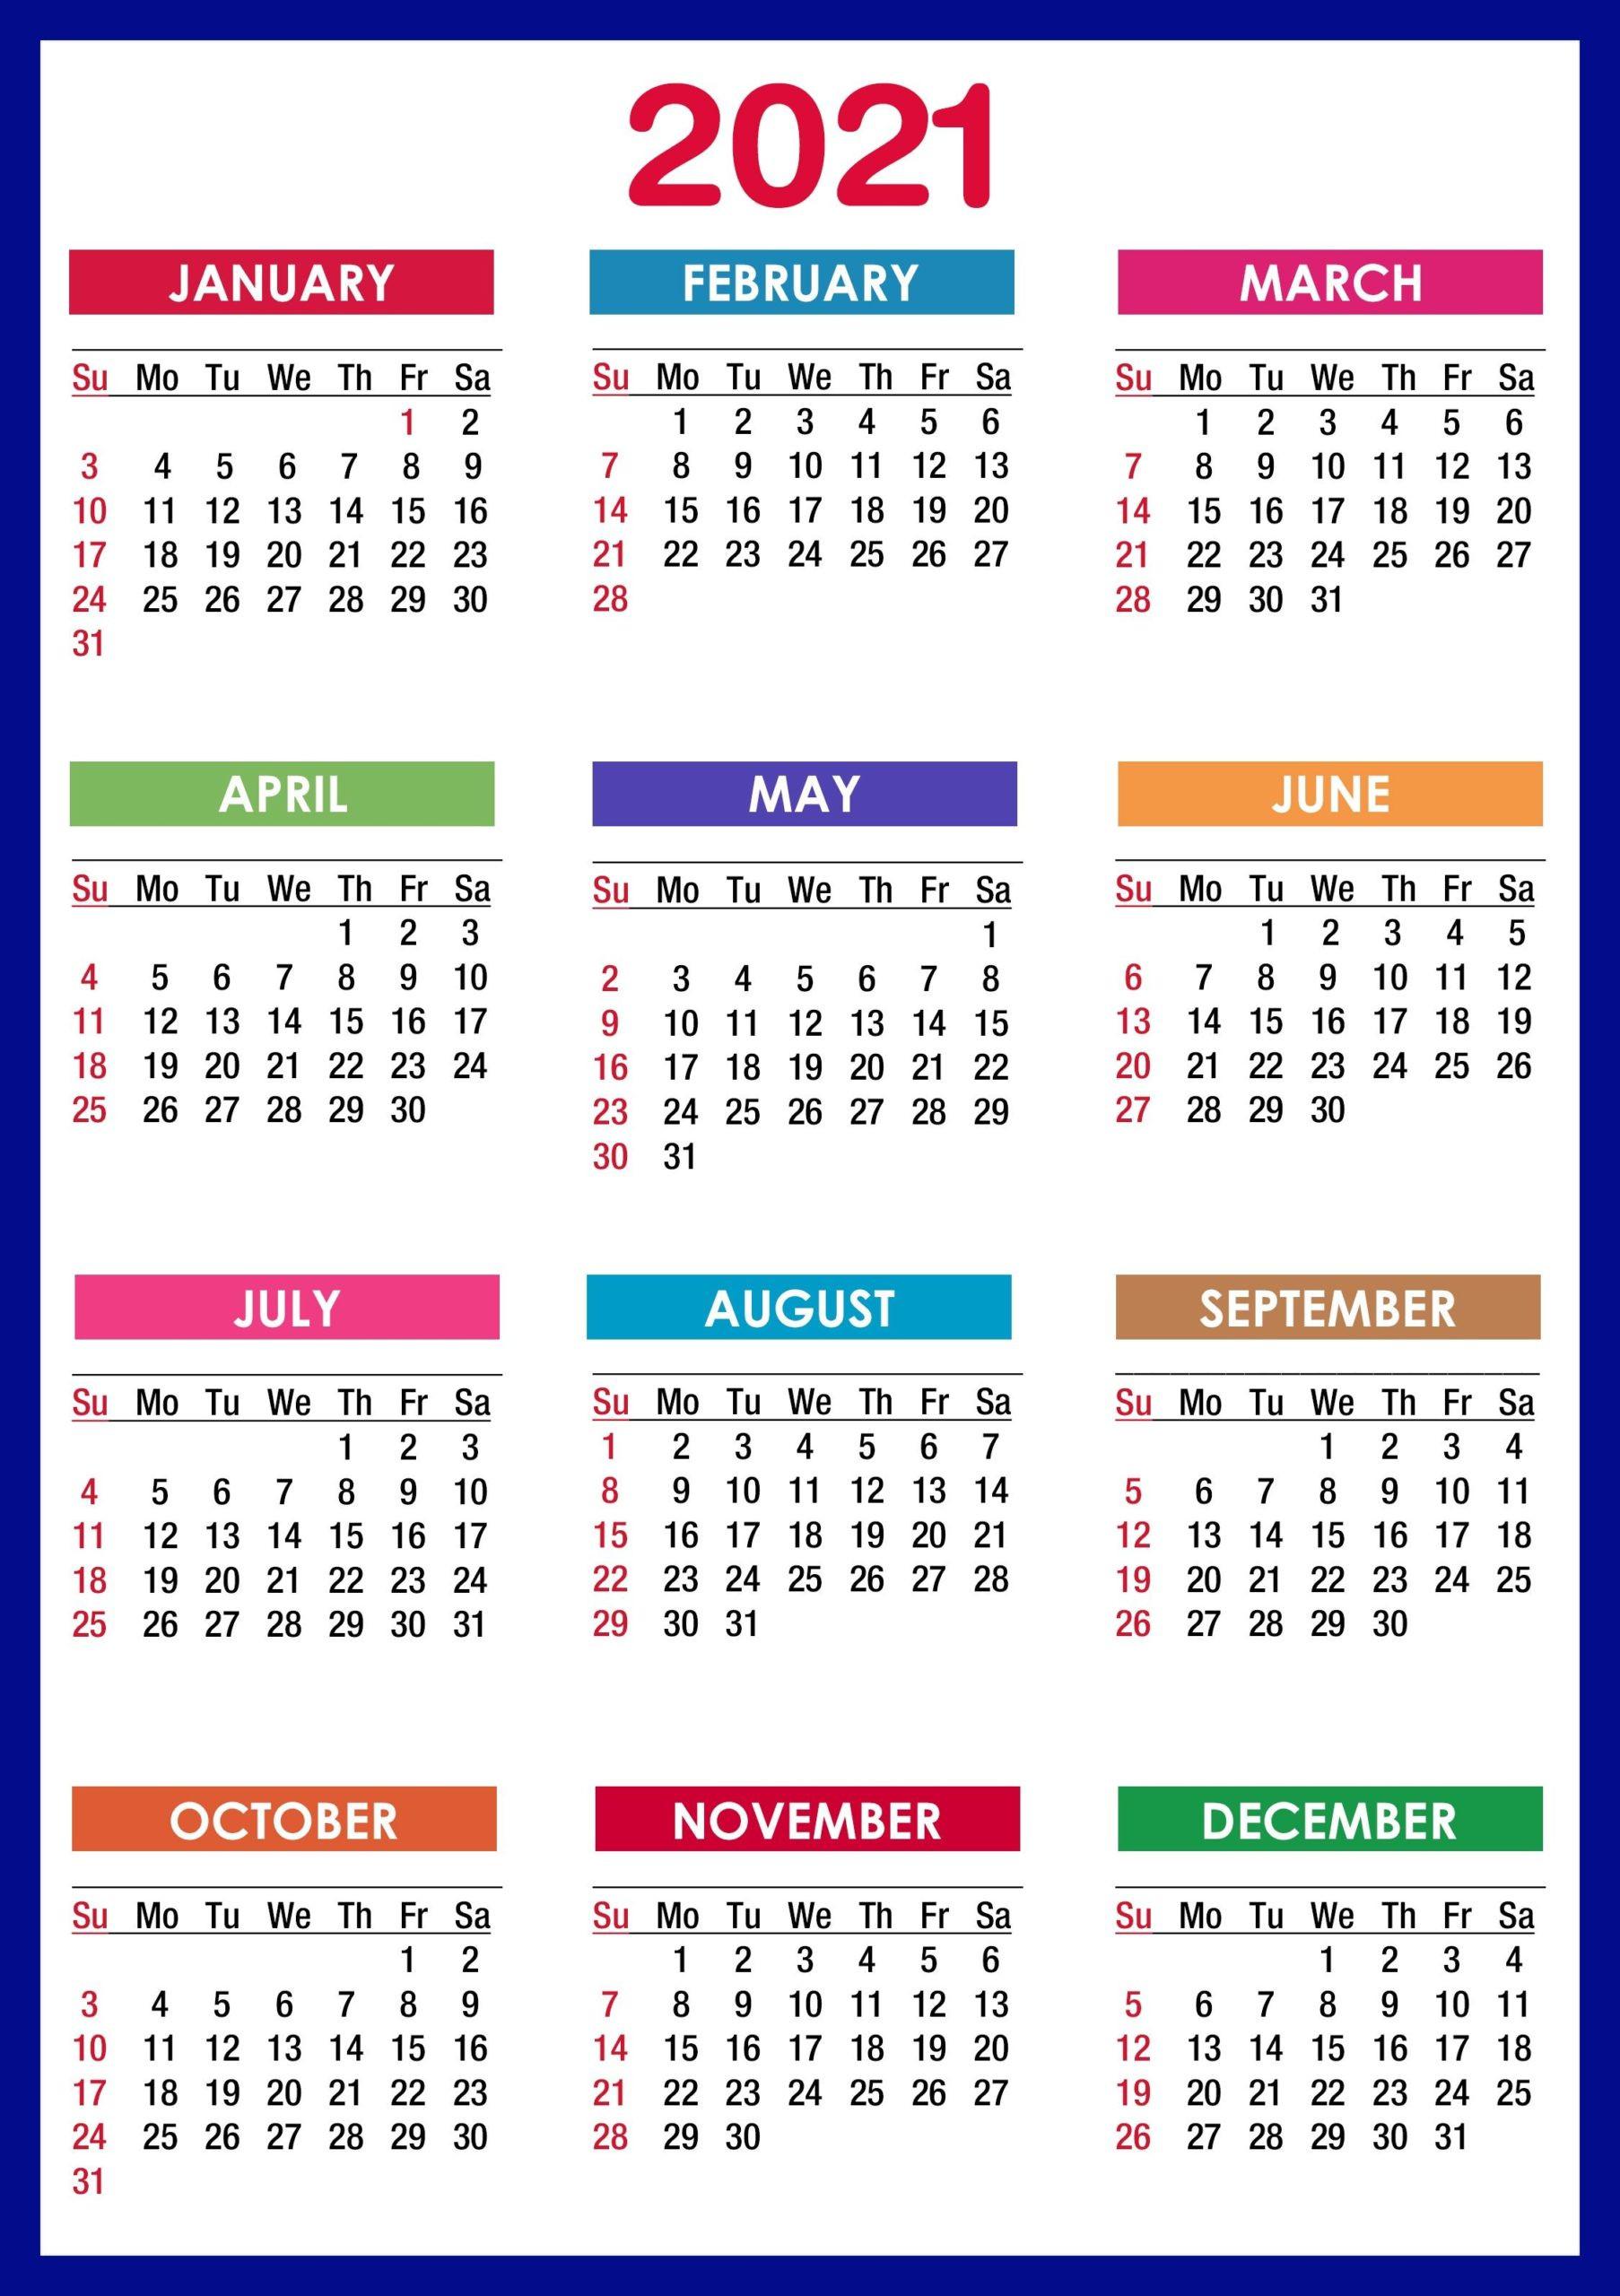 2021 Calendar Printable   12 Months All In One   Calendar 2021-Printable Month To Month Calendar 2021